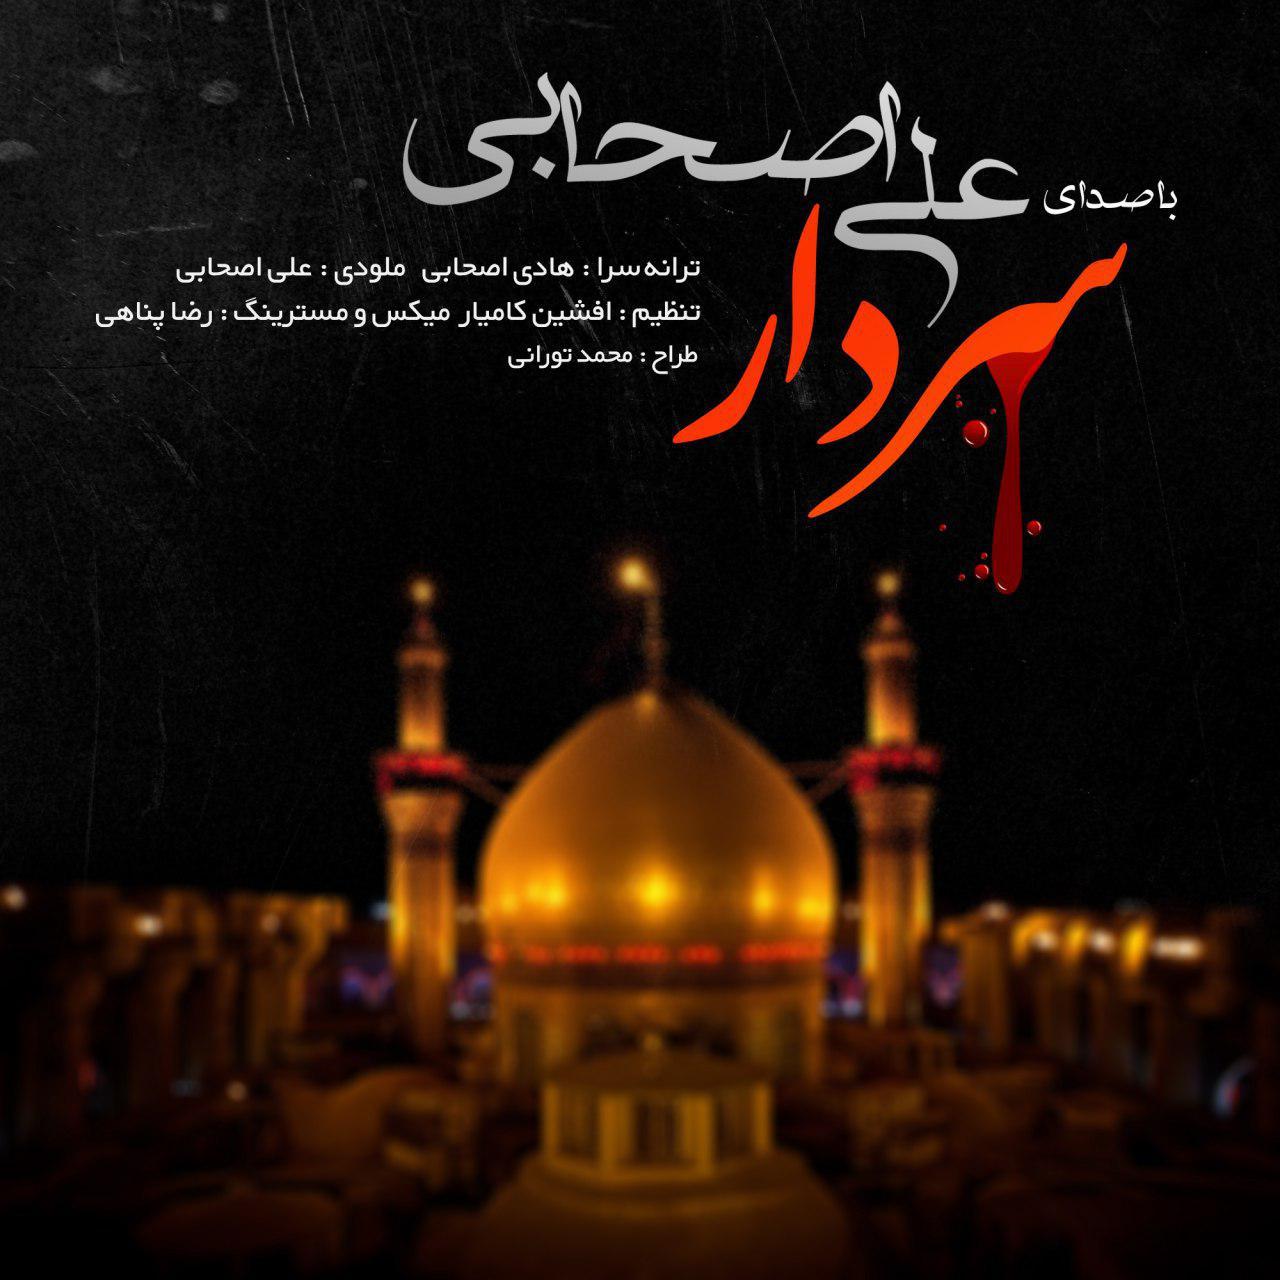 http://www.ganja2music.com/Image/Post/9.2017/Ali%20Ashabi%20-%20Sardar.jpg